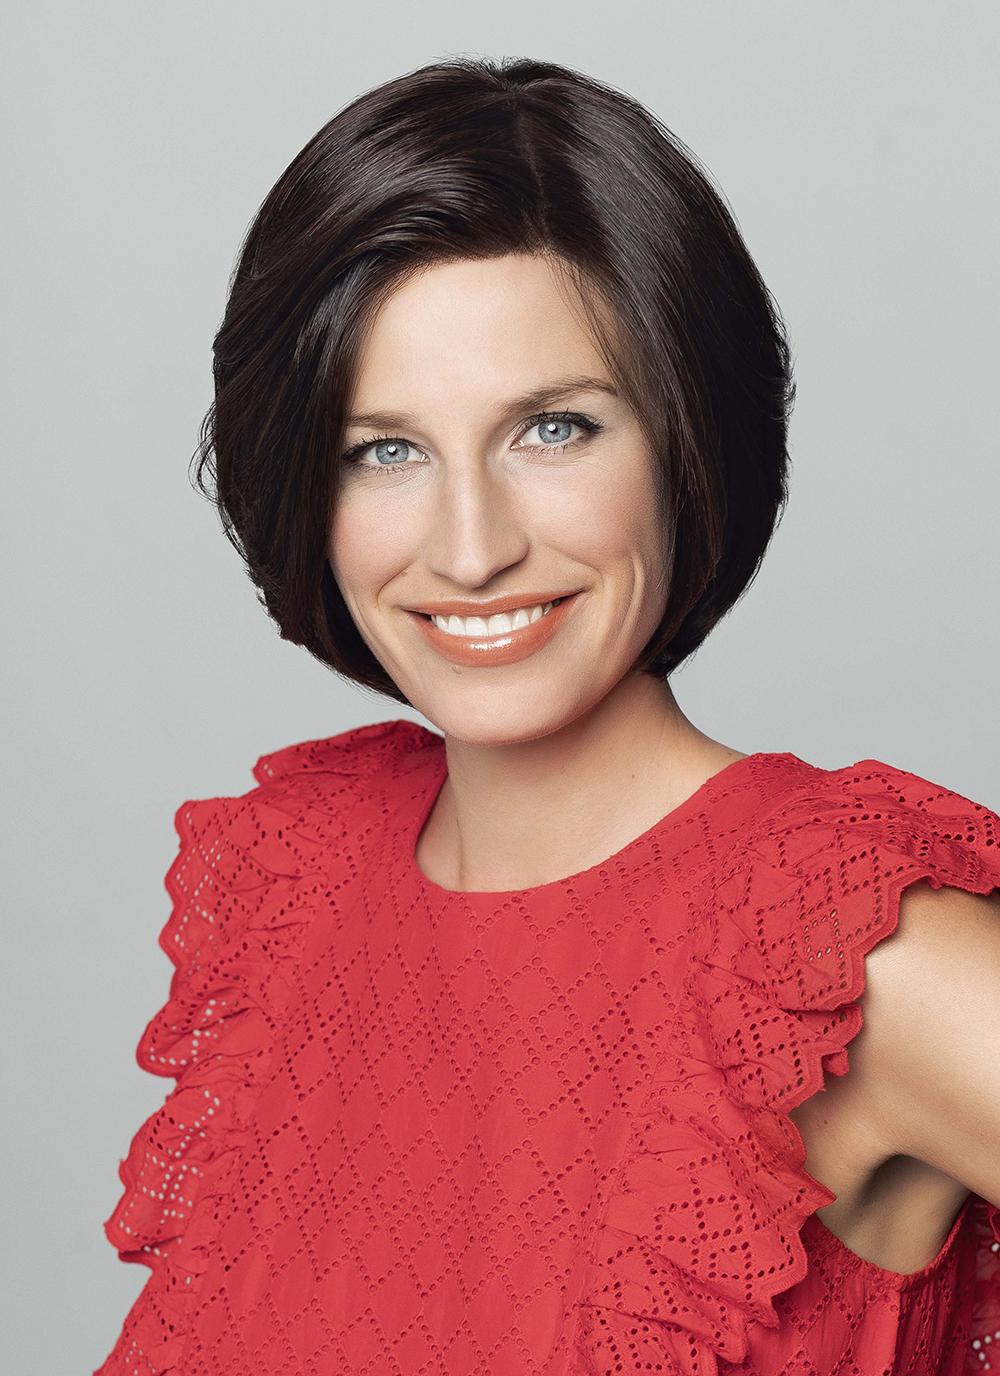 Gisela Mayer Perücke: Duo Fiber - Abbey